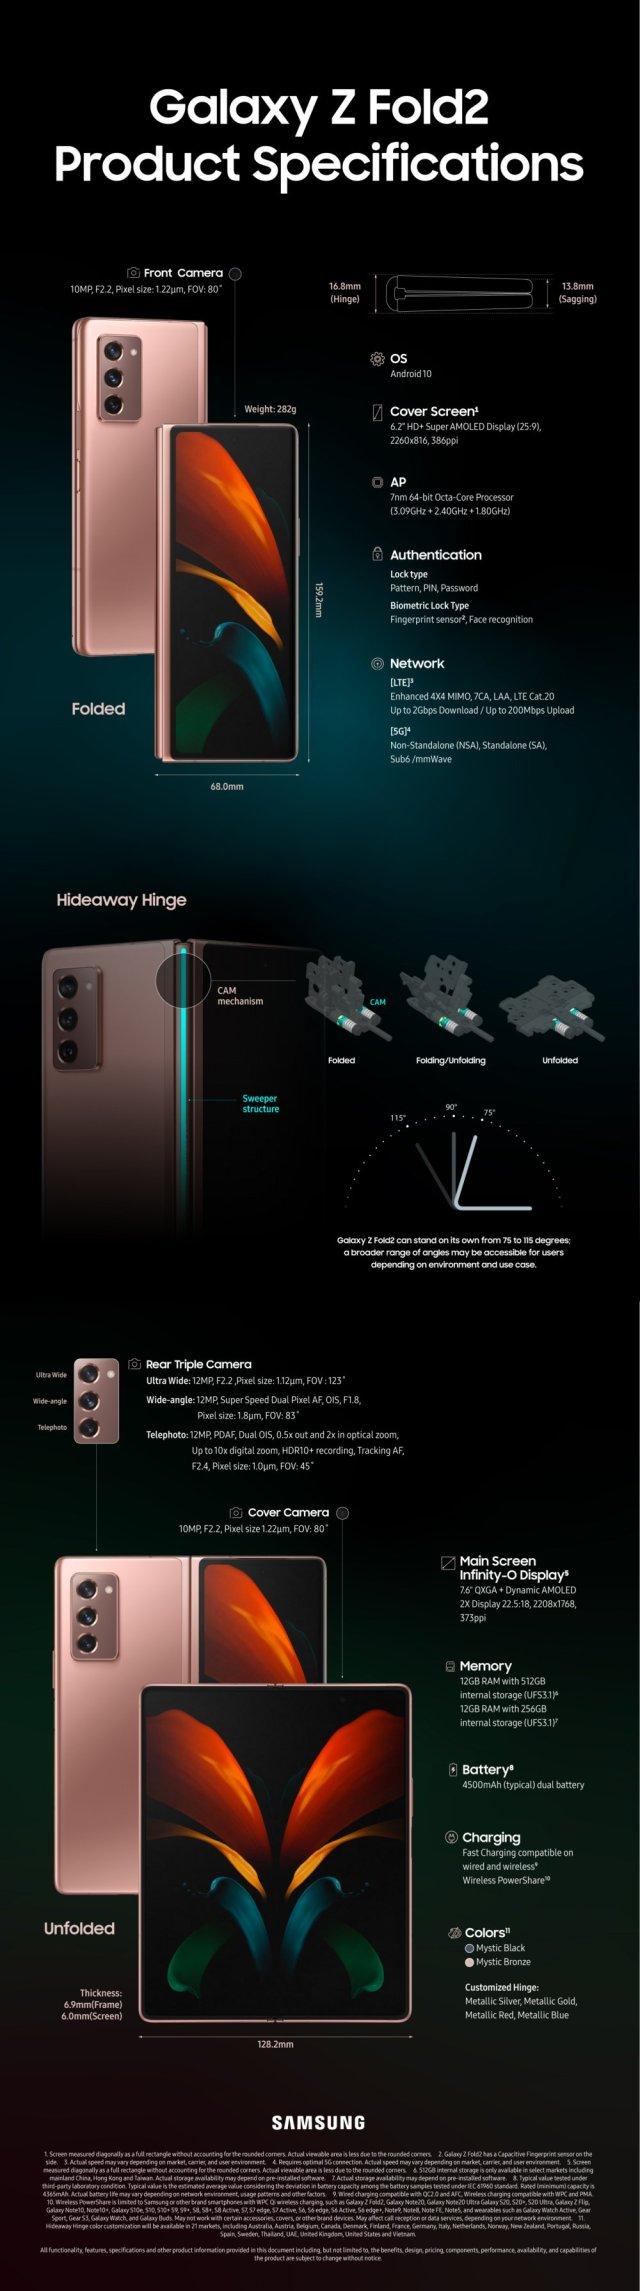 Samsung Galaxy Z Fold 2 Infographic